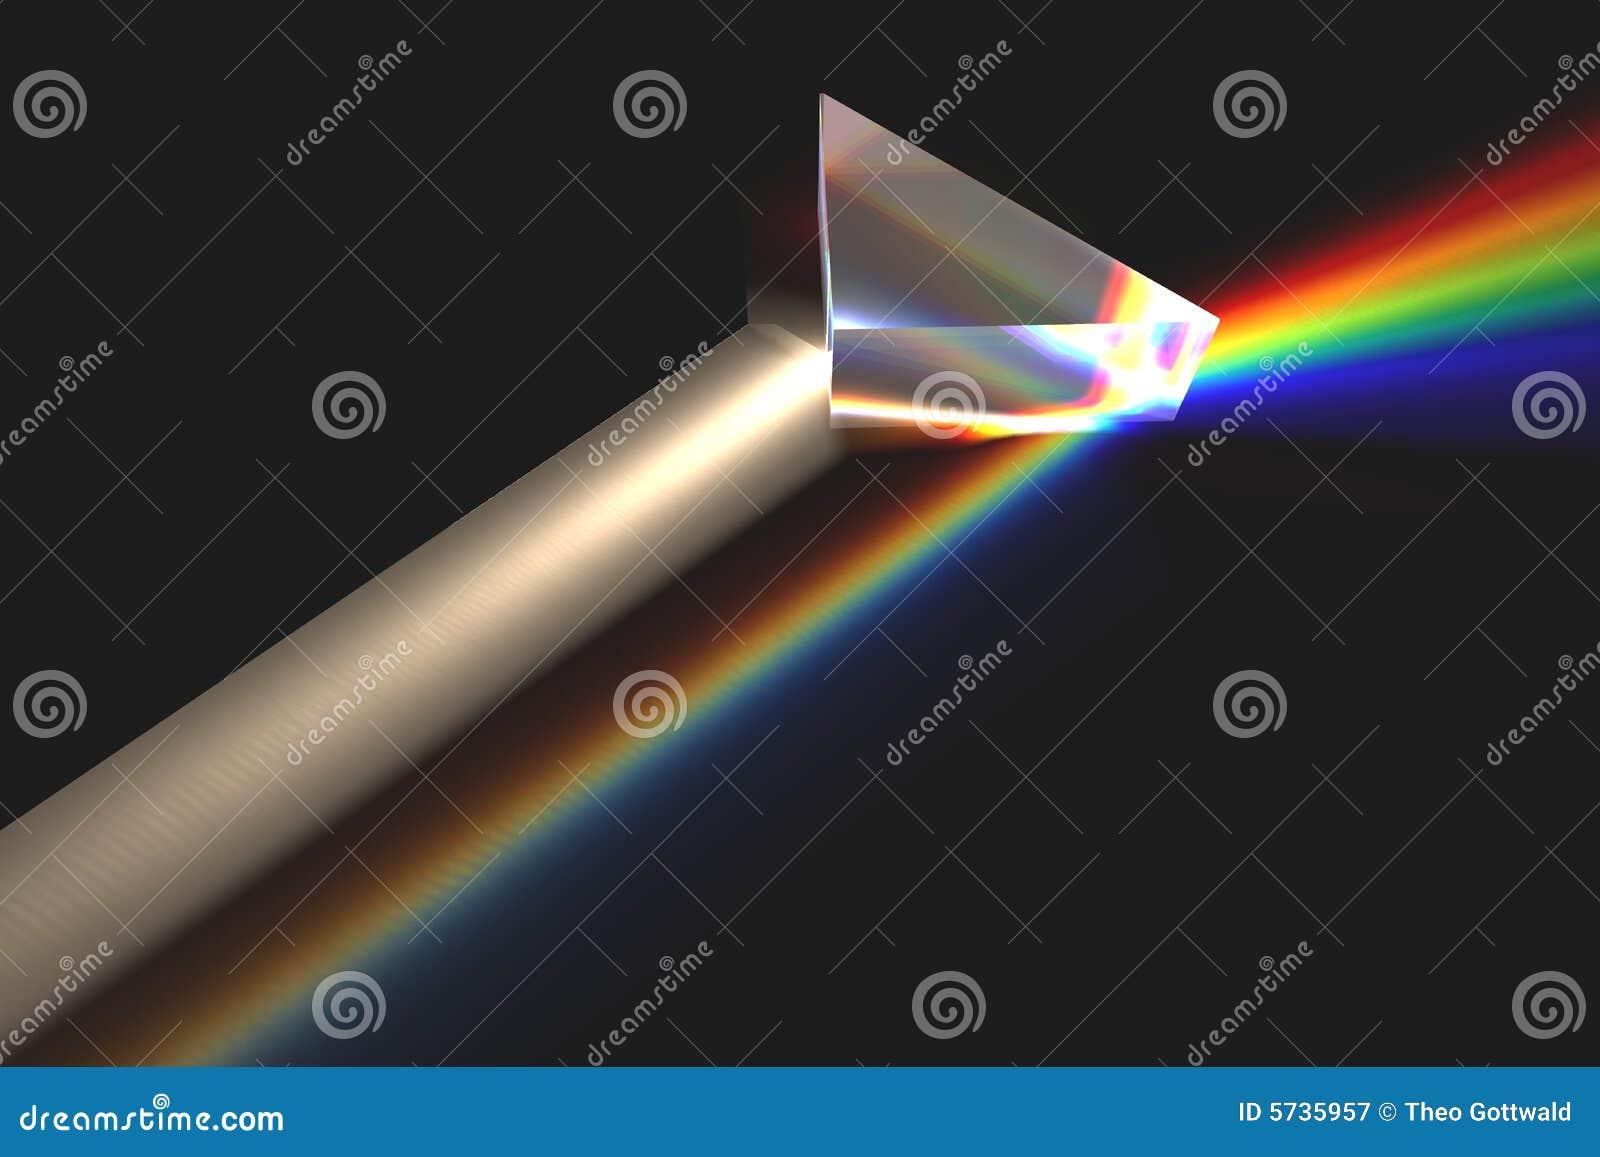 Refracting Prism